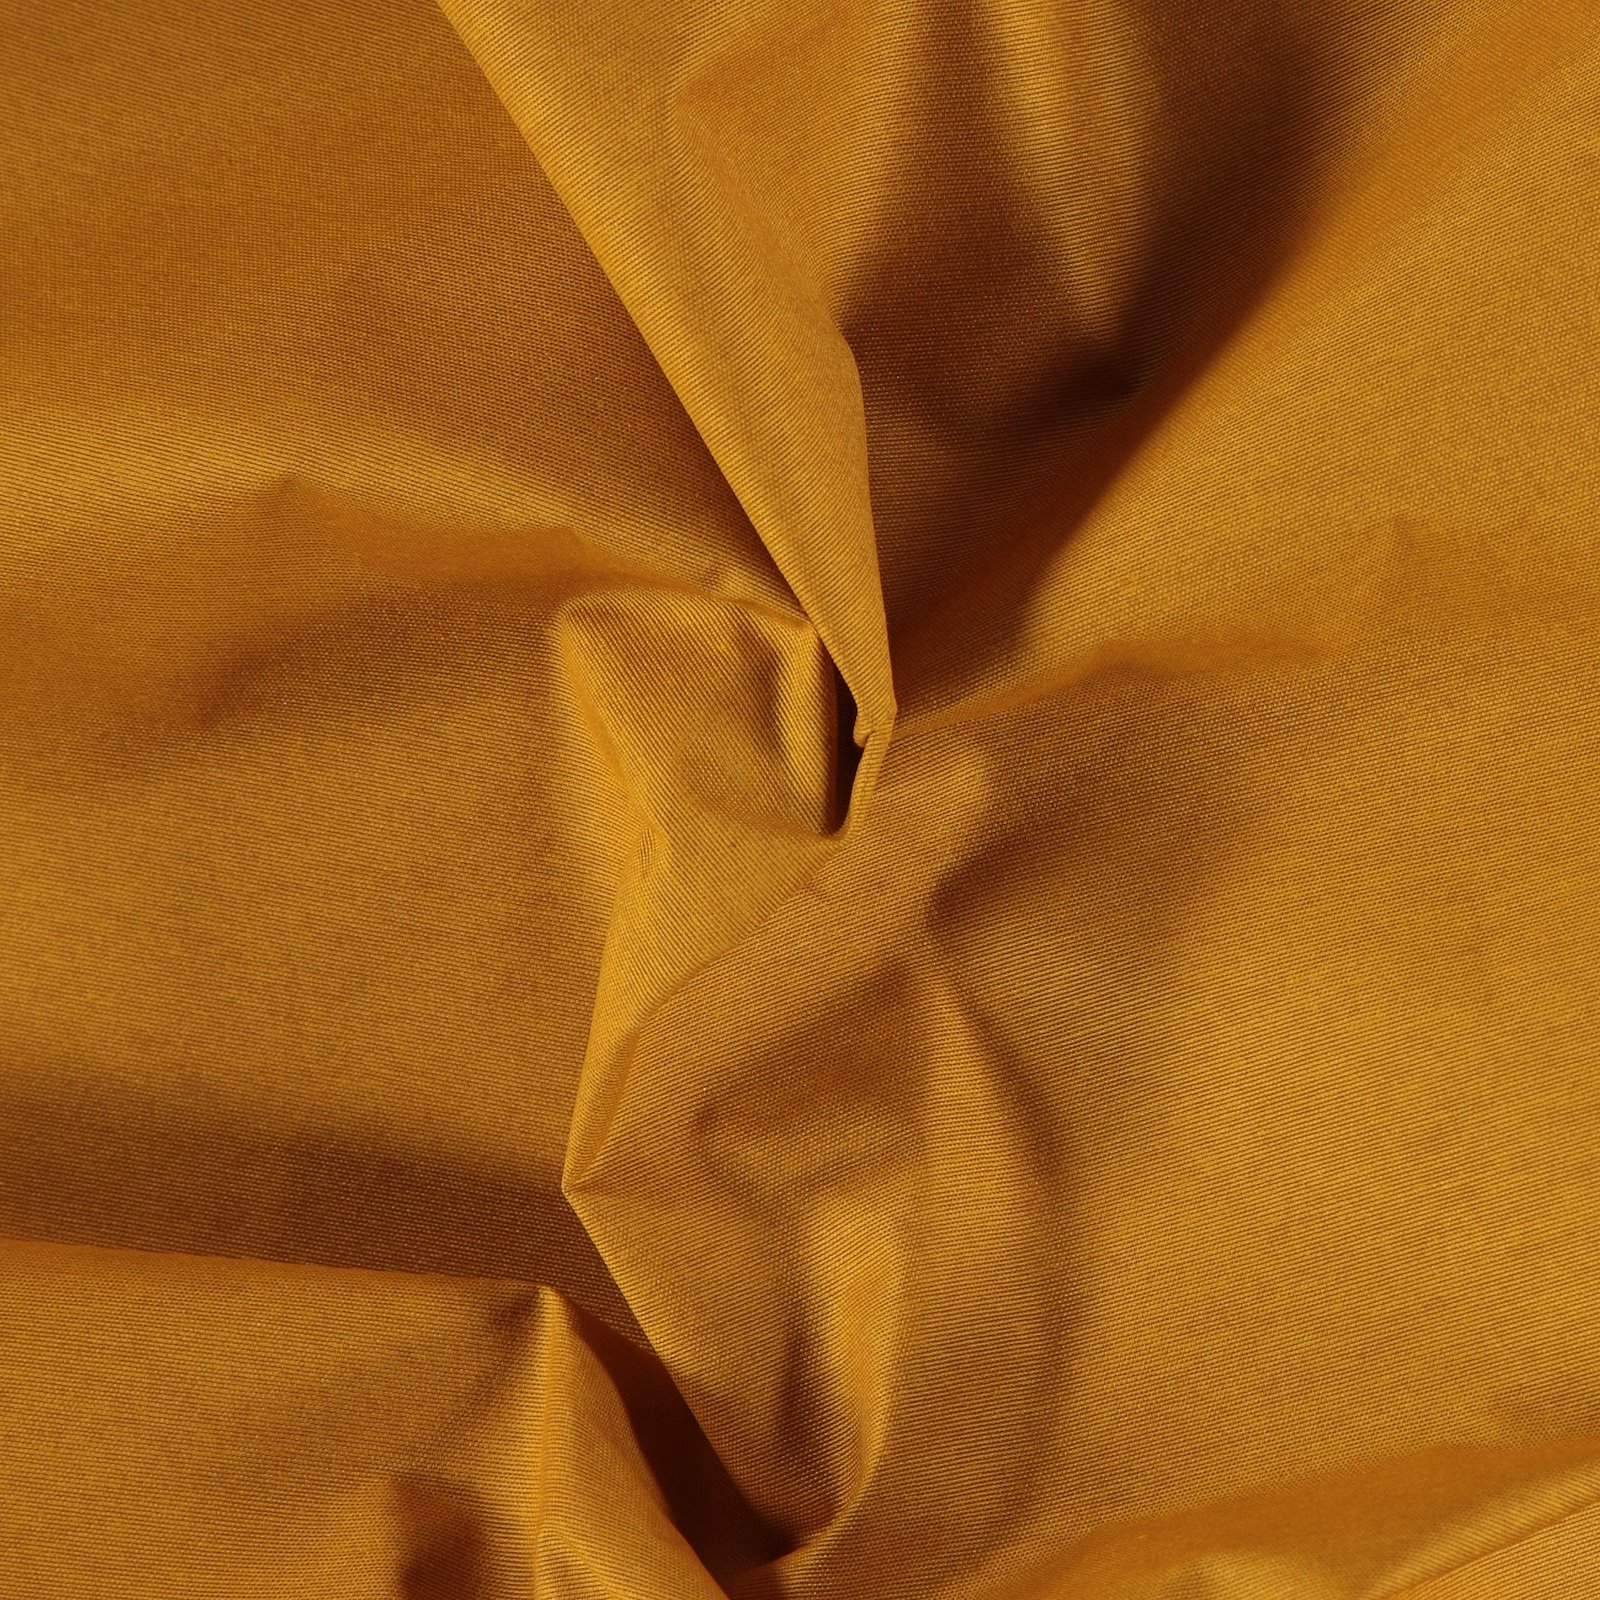 Woven oilcloth golden brown 160 cm 870362_pack